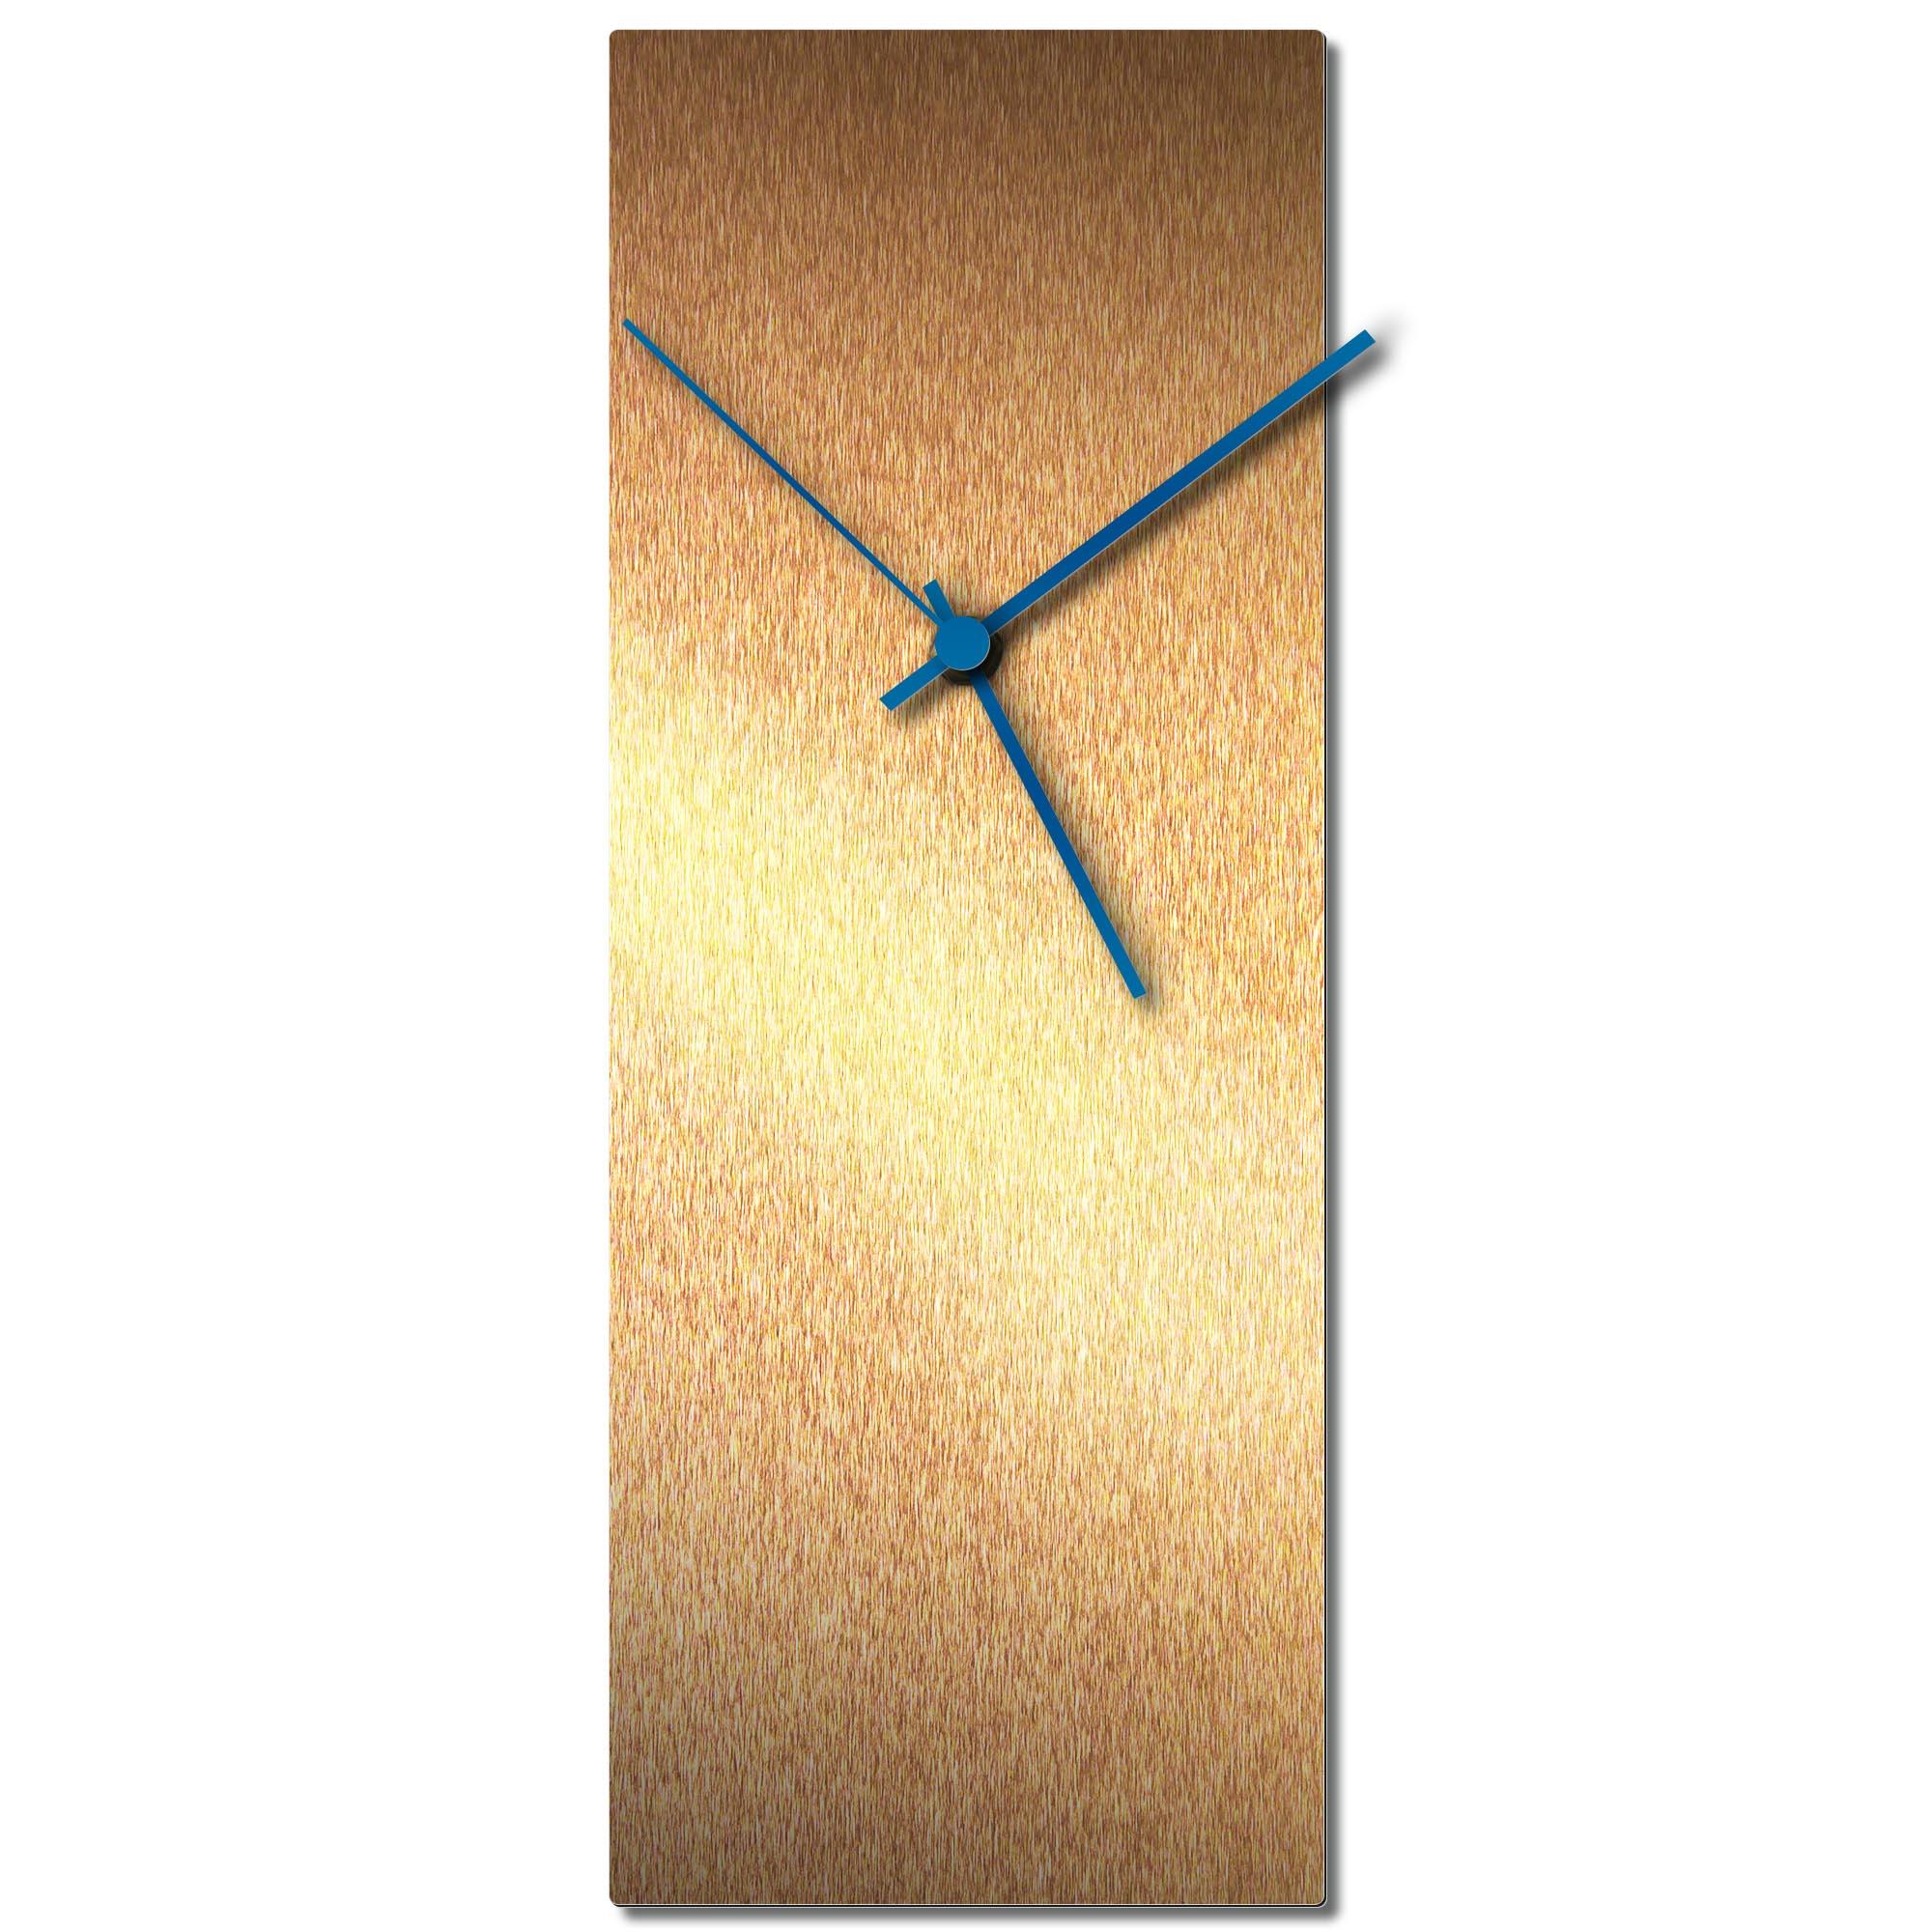 Adam Schwoeppe 'Bronzesmith Clock Blue' Midcentury Modern Style Wall Clock